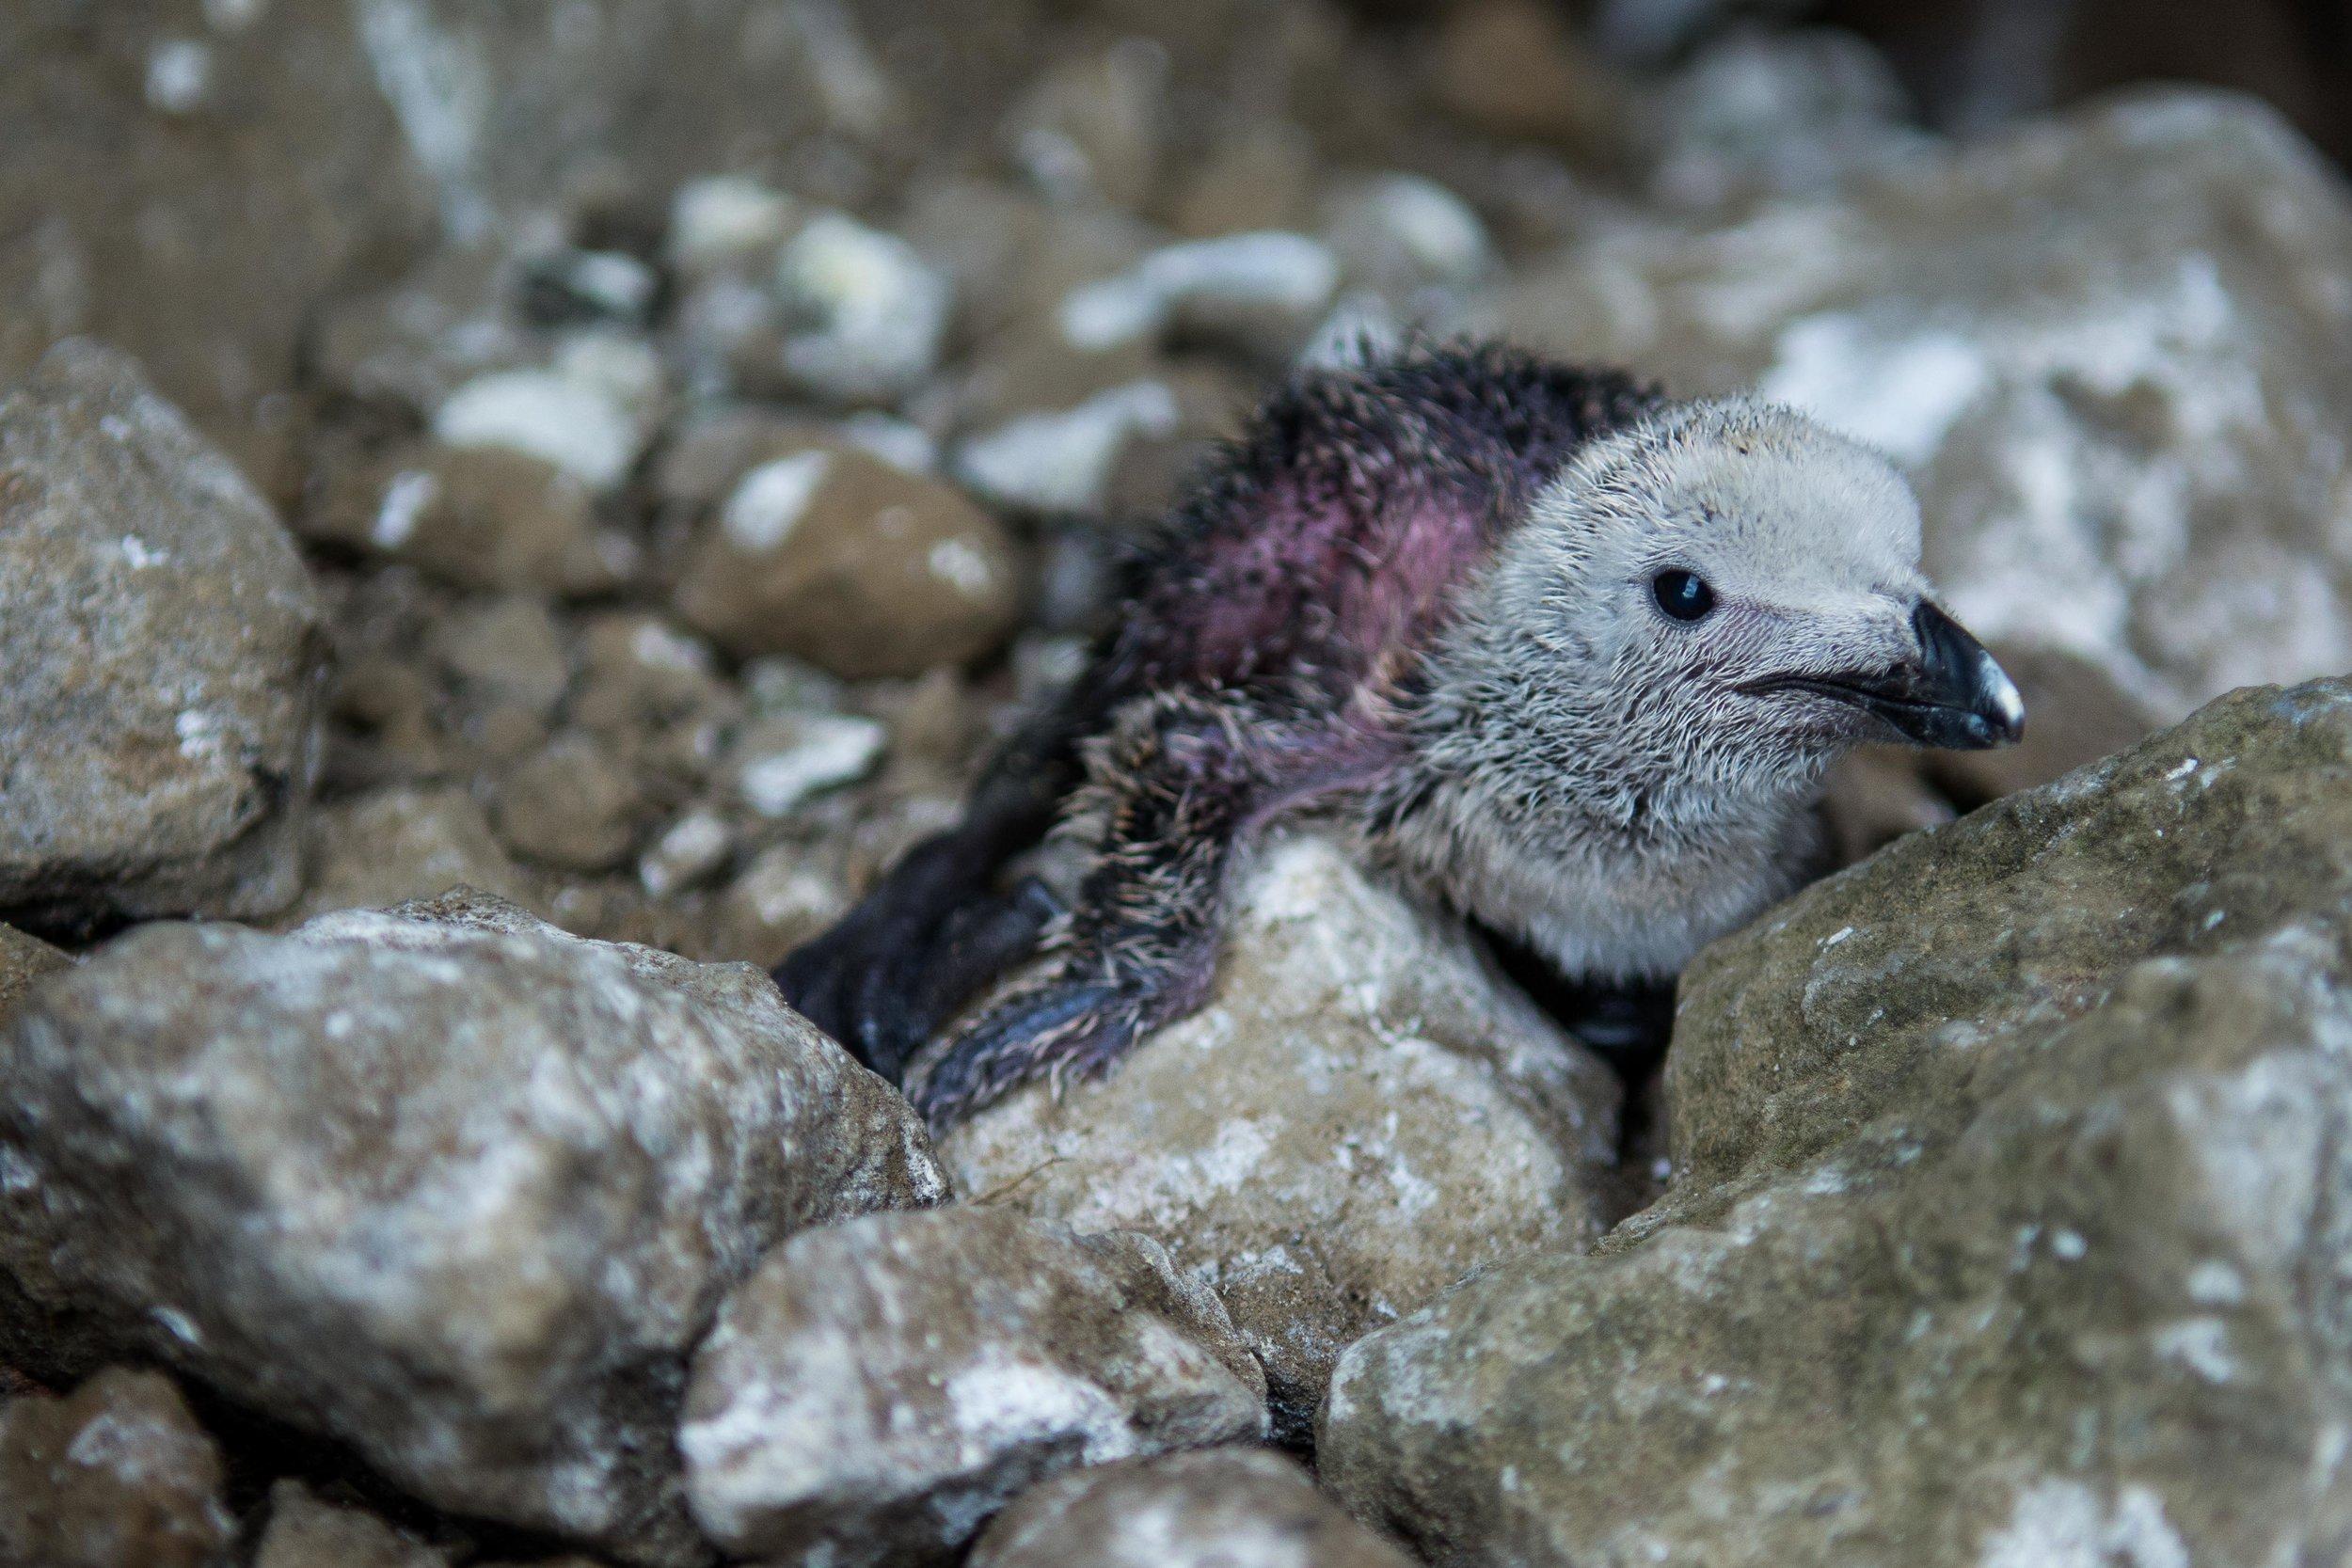 A newly hatched Razorbill